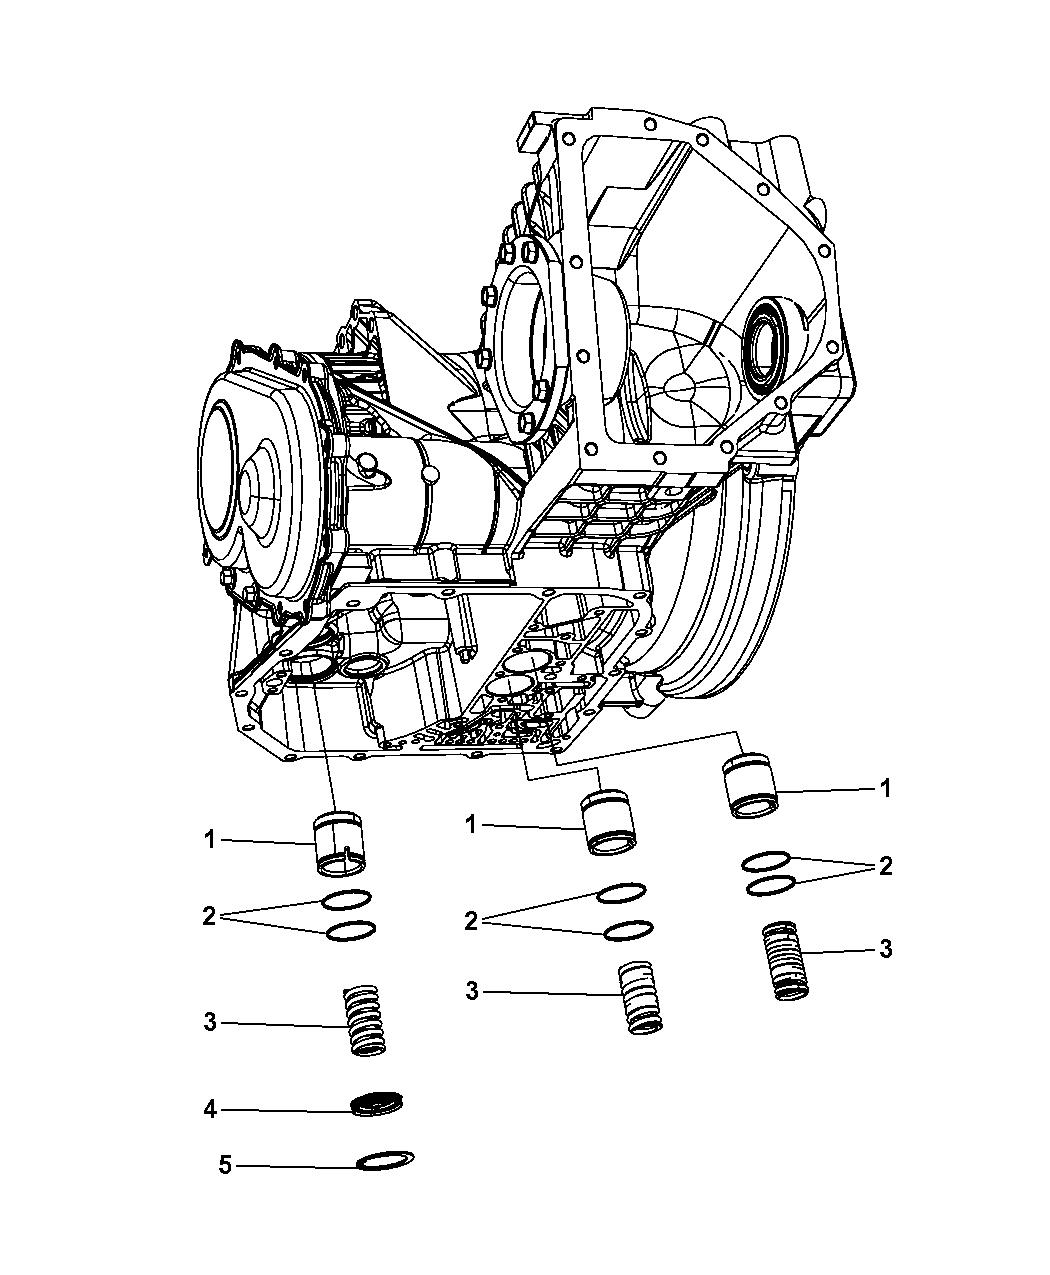 2008 Chrysler PT Cruiser Accumulator & Related Parts